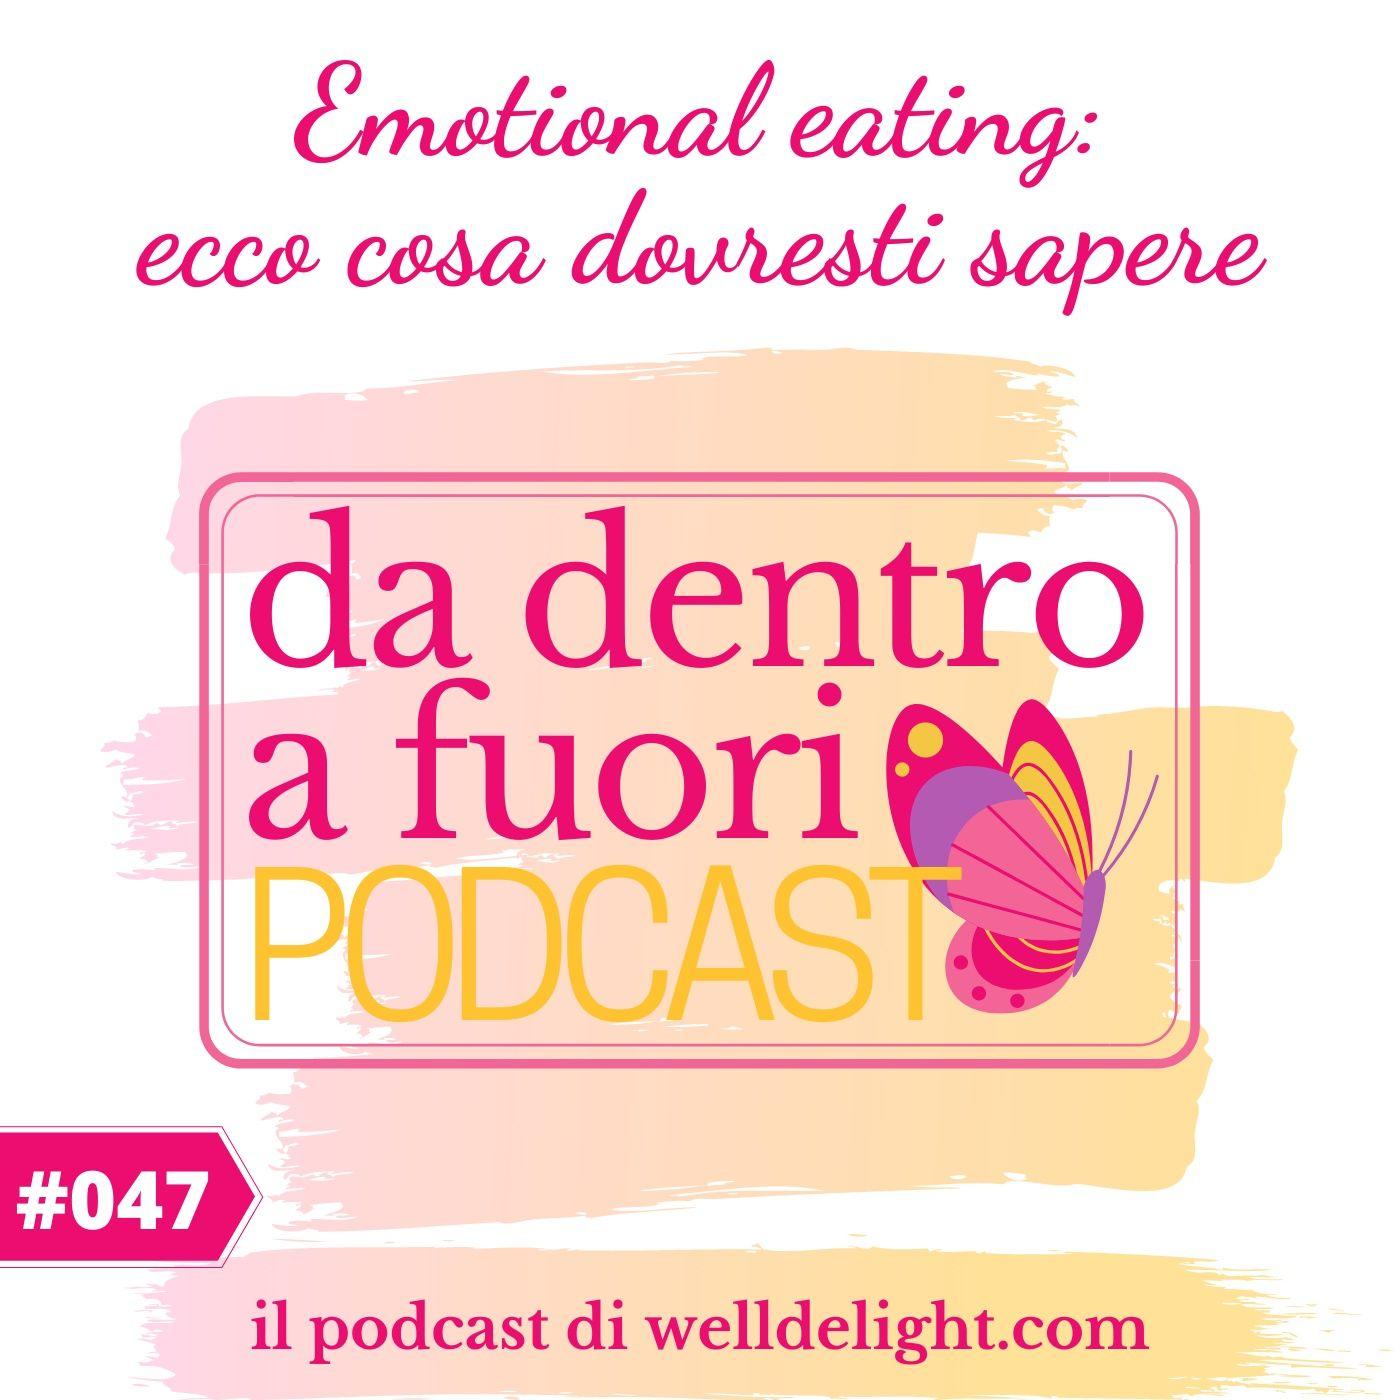 Emotional eating: ecco cosa dovresti sapere